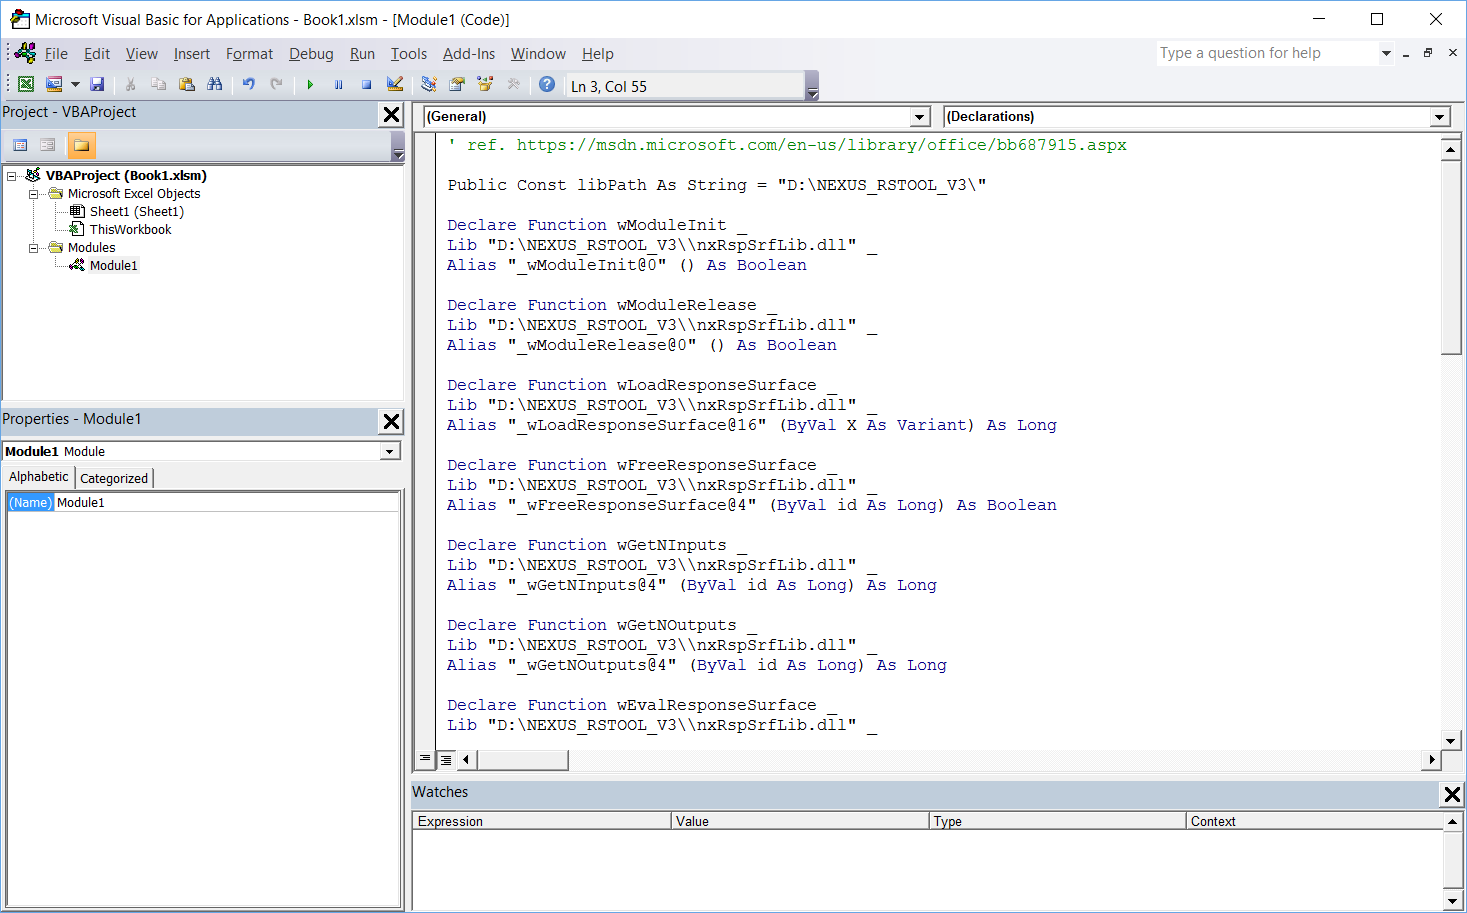 Declare Function Lib Excel Vba adding PtrSafe to vba function call